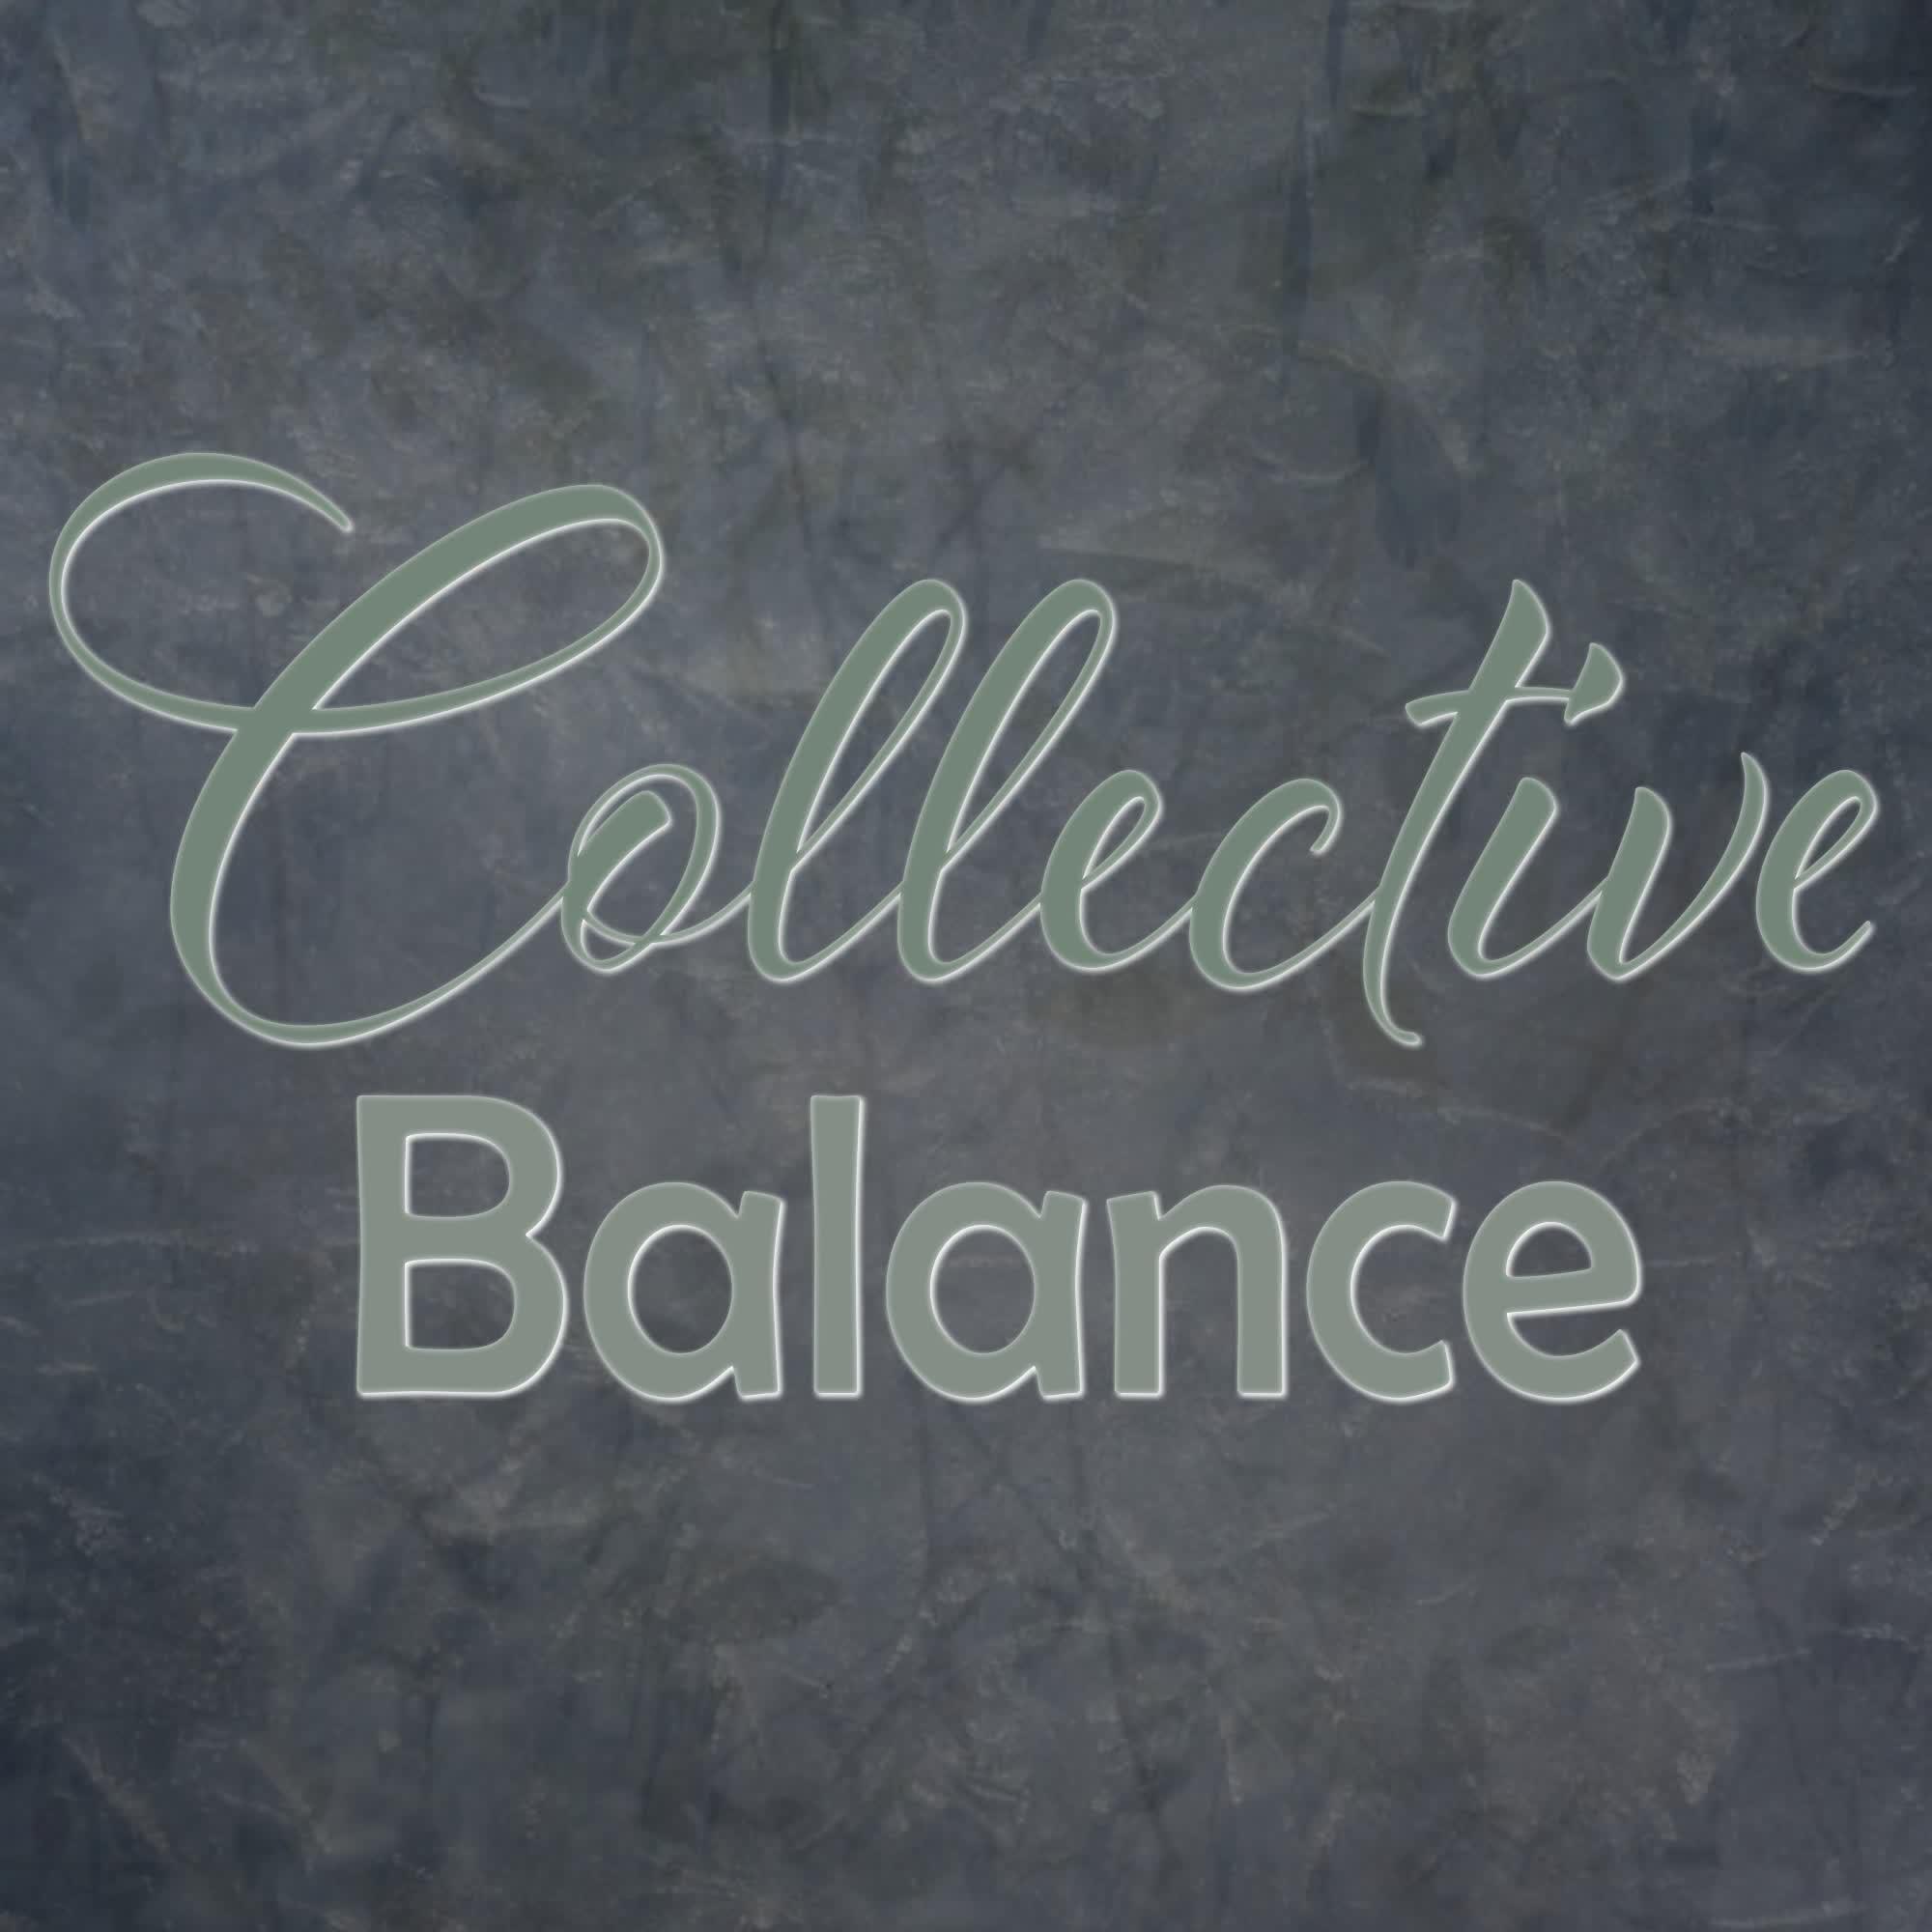 Collective Balance